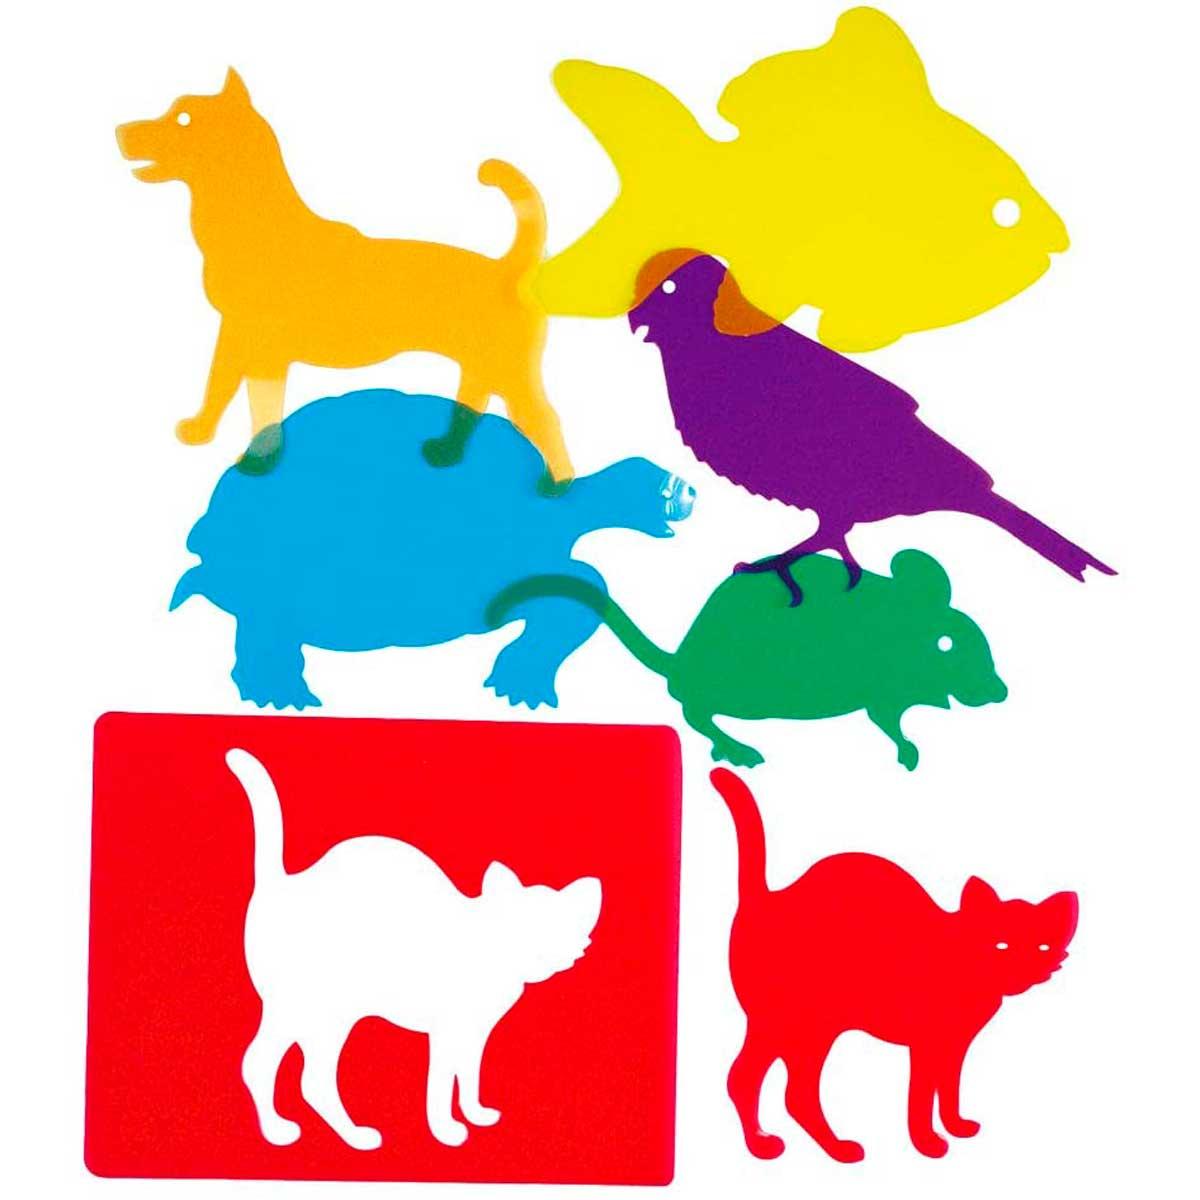 Plantillas translúcidas mascotas caja de luz